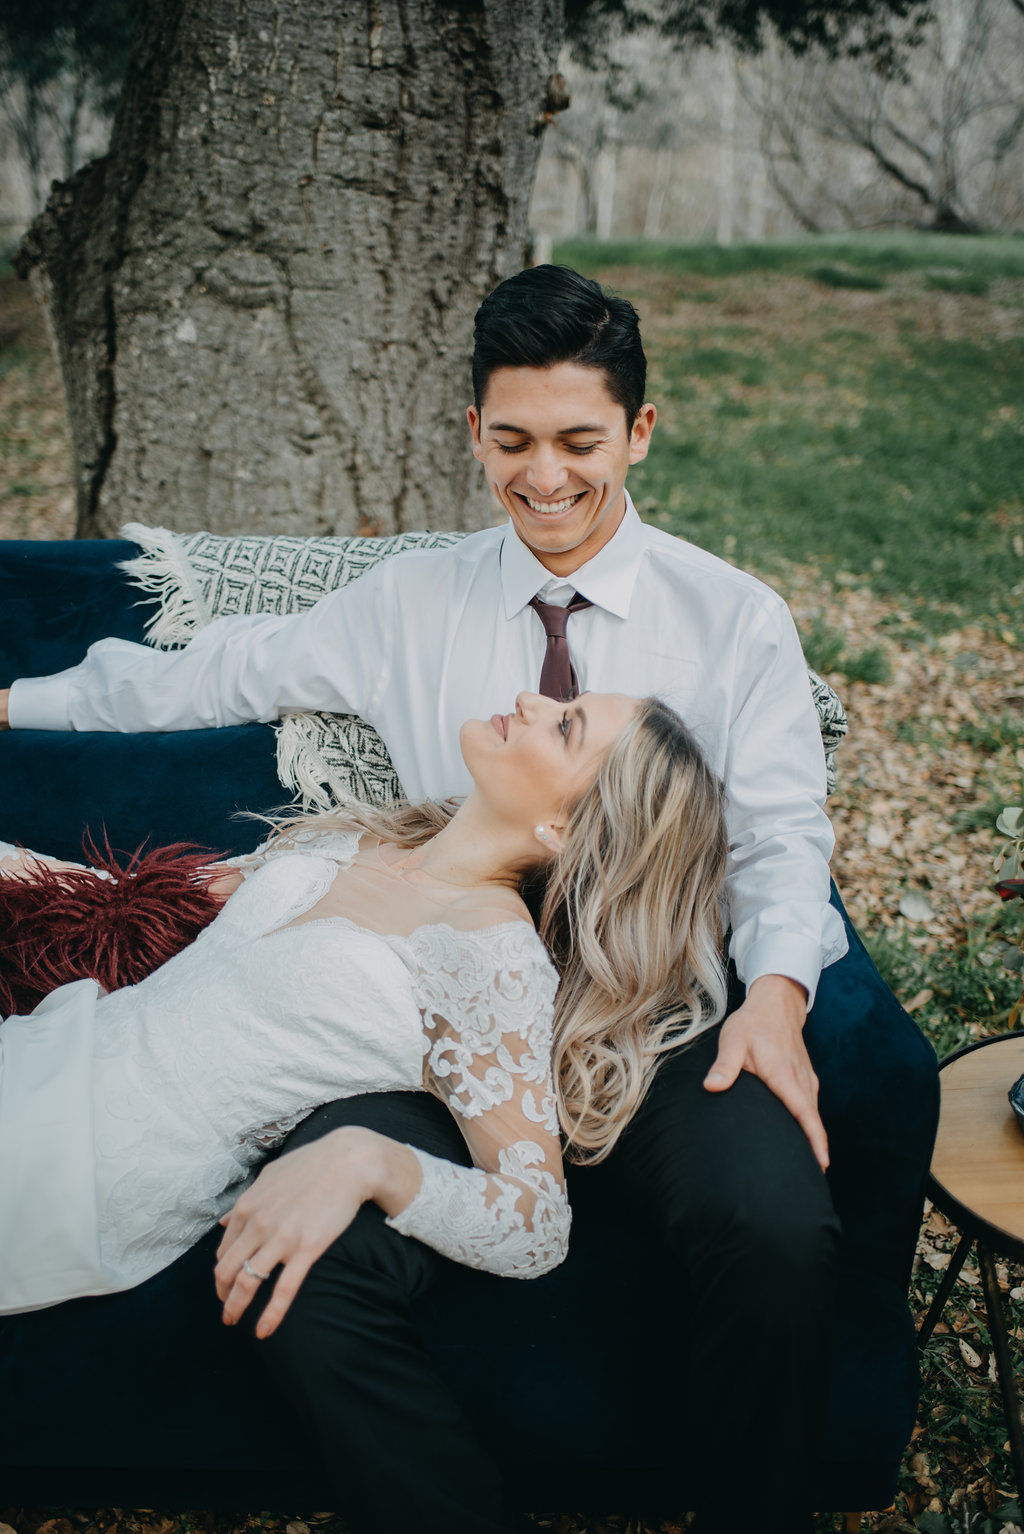 fun wedding couples photo inspiration